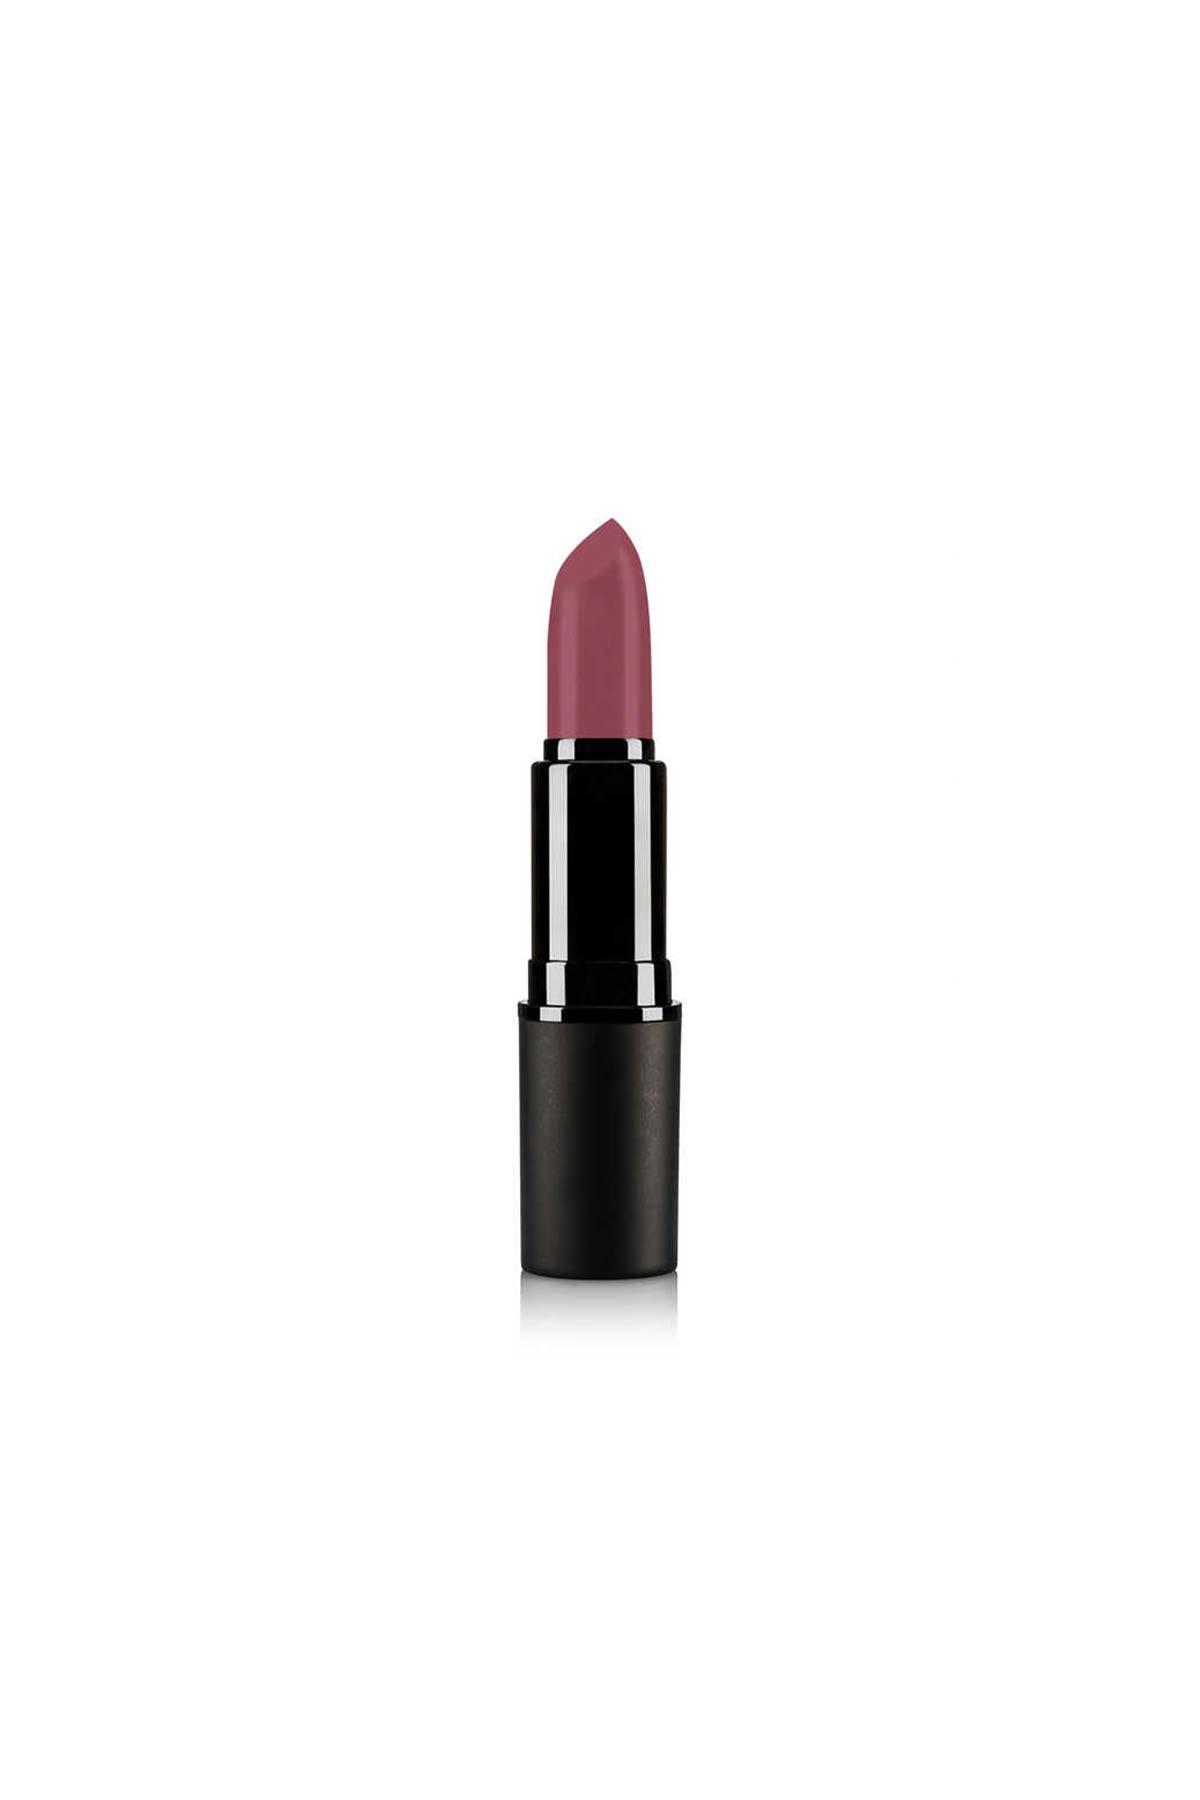 Matte Lipstick - 187 -Ruj - Lipstick Thumbnail